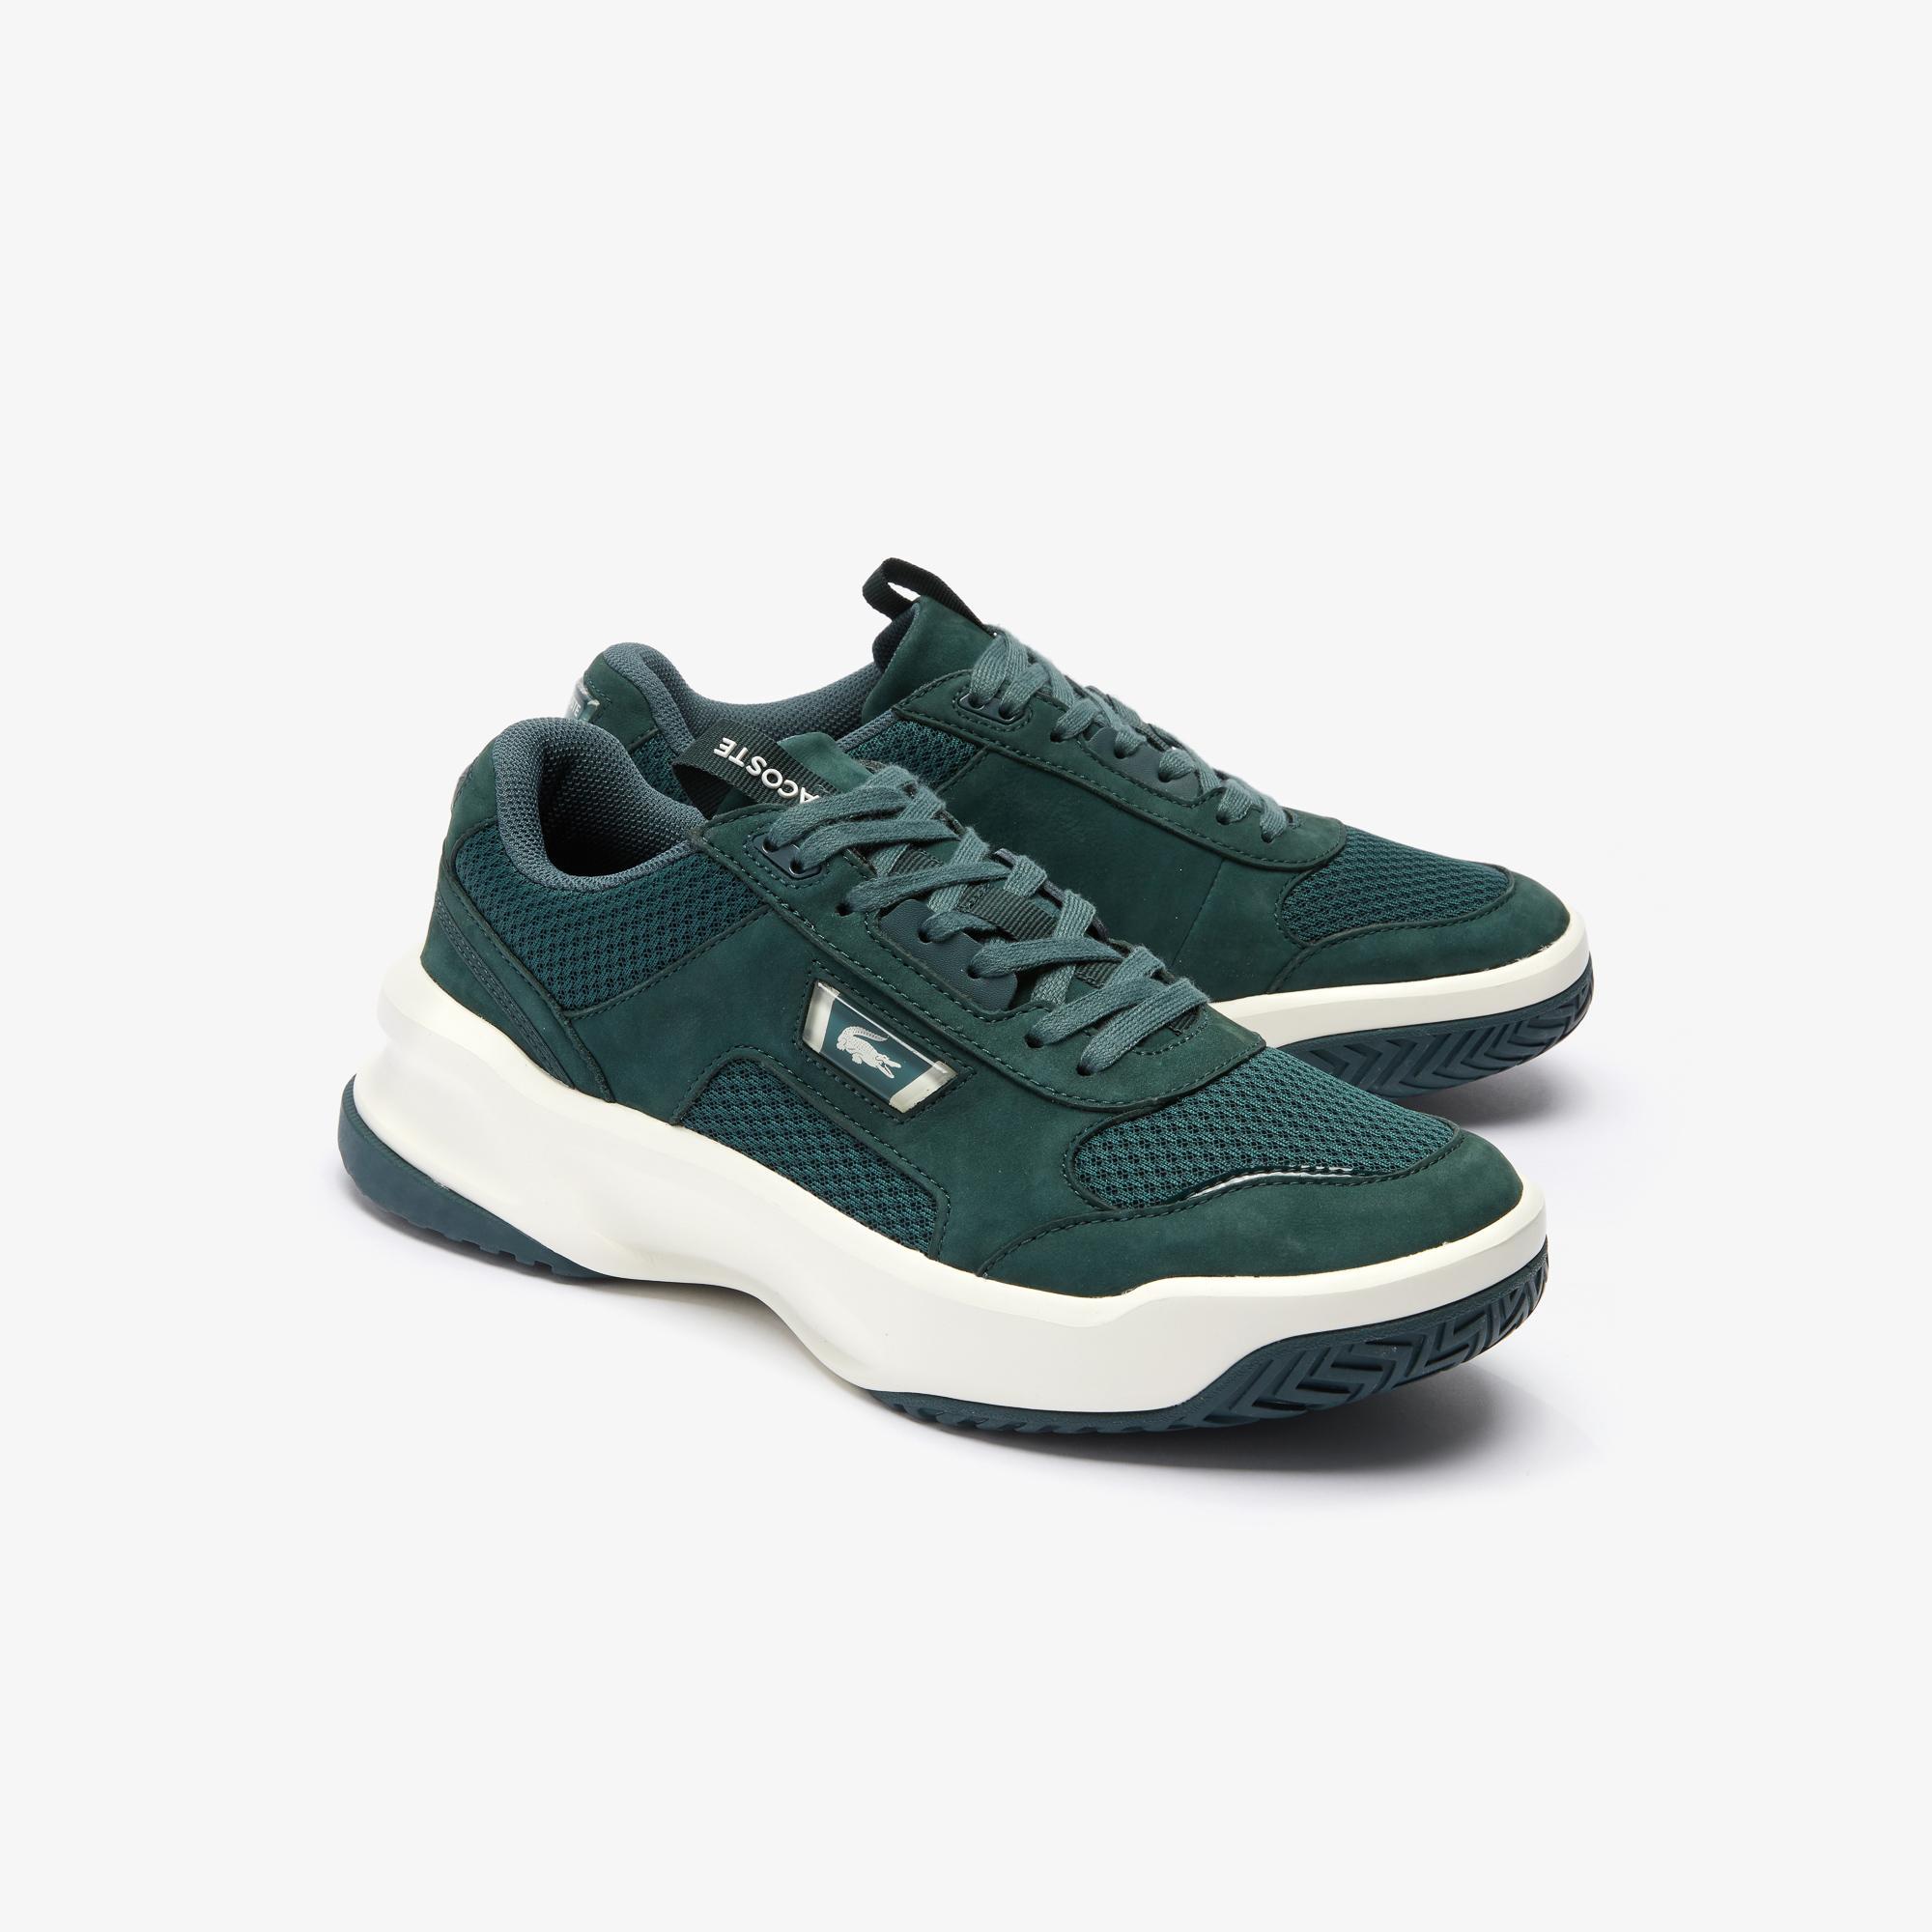 Lacoste Ace Lift 0120 3 Sma Erkek Koyu Yeşil - Beyaz Sneaker